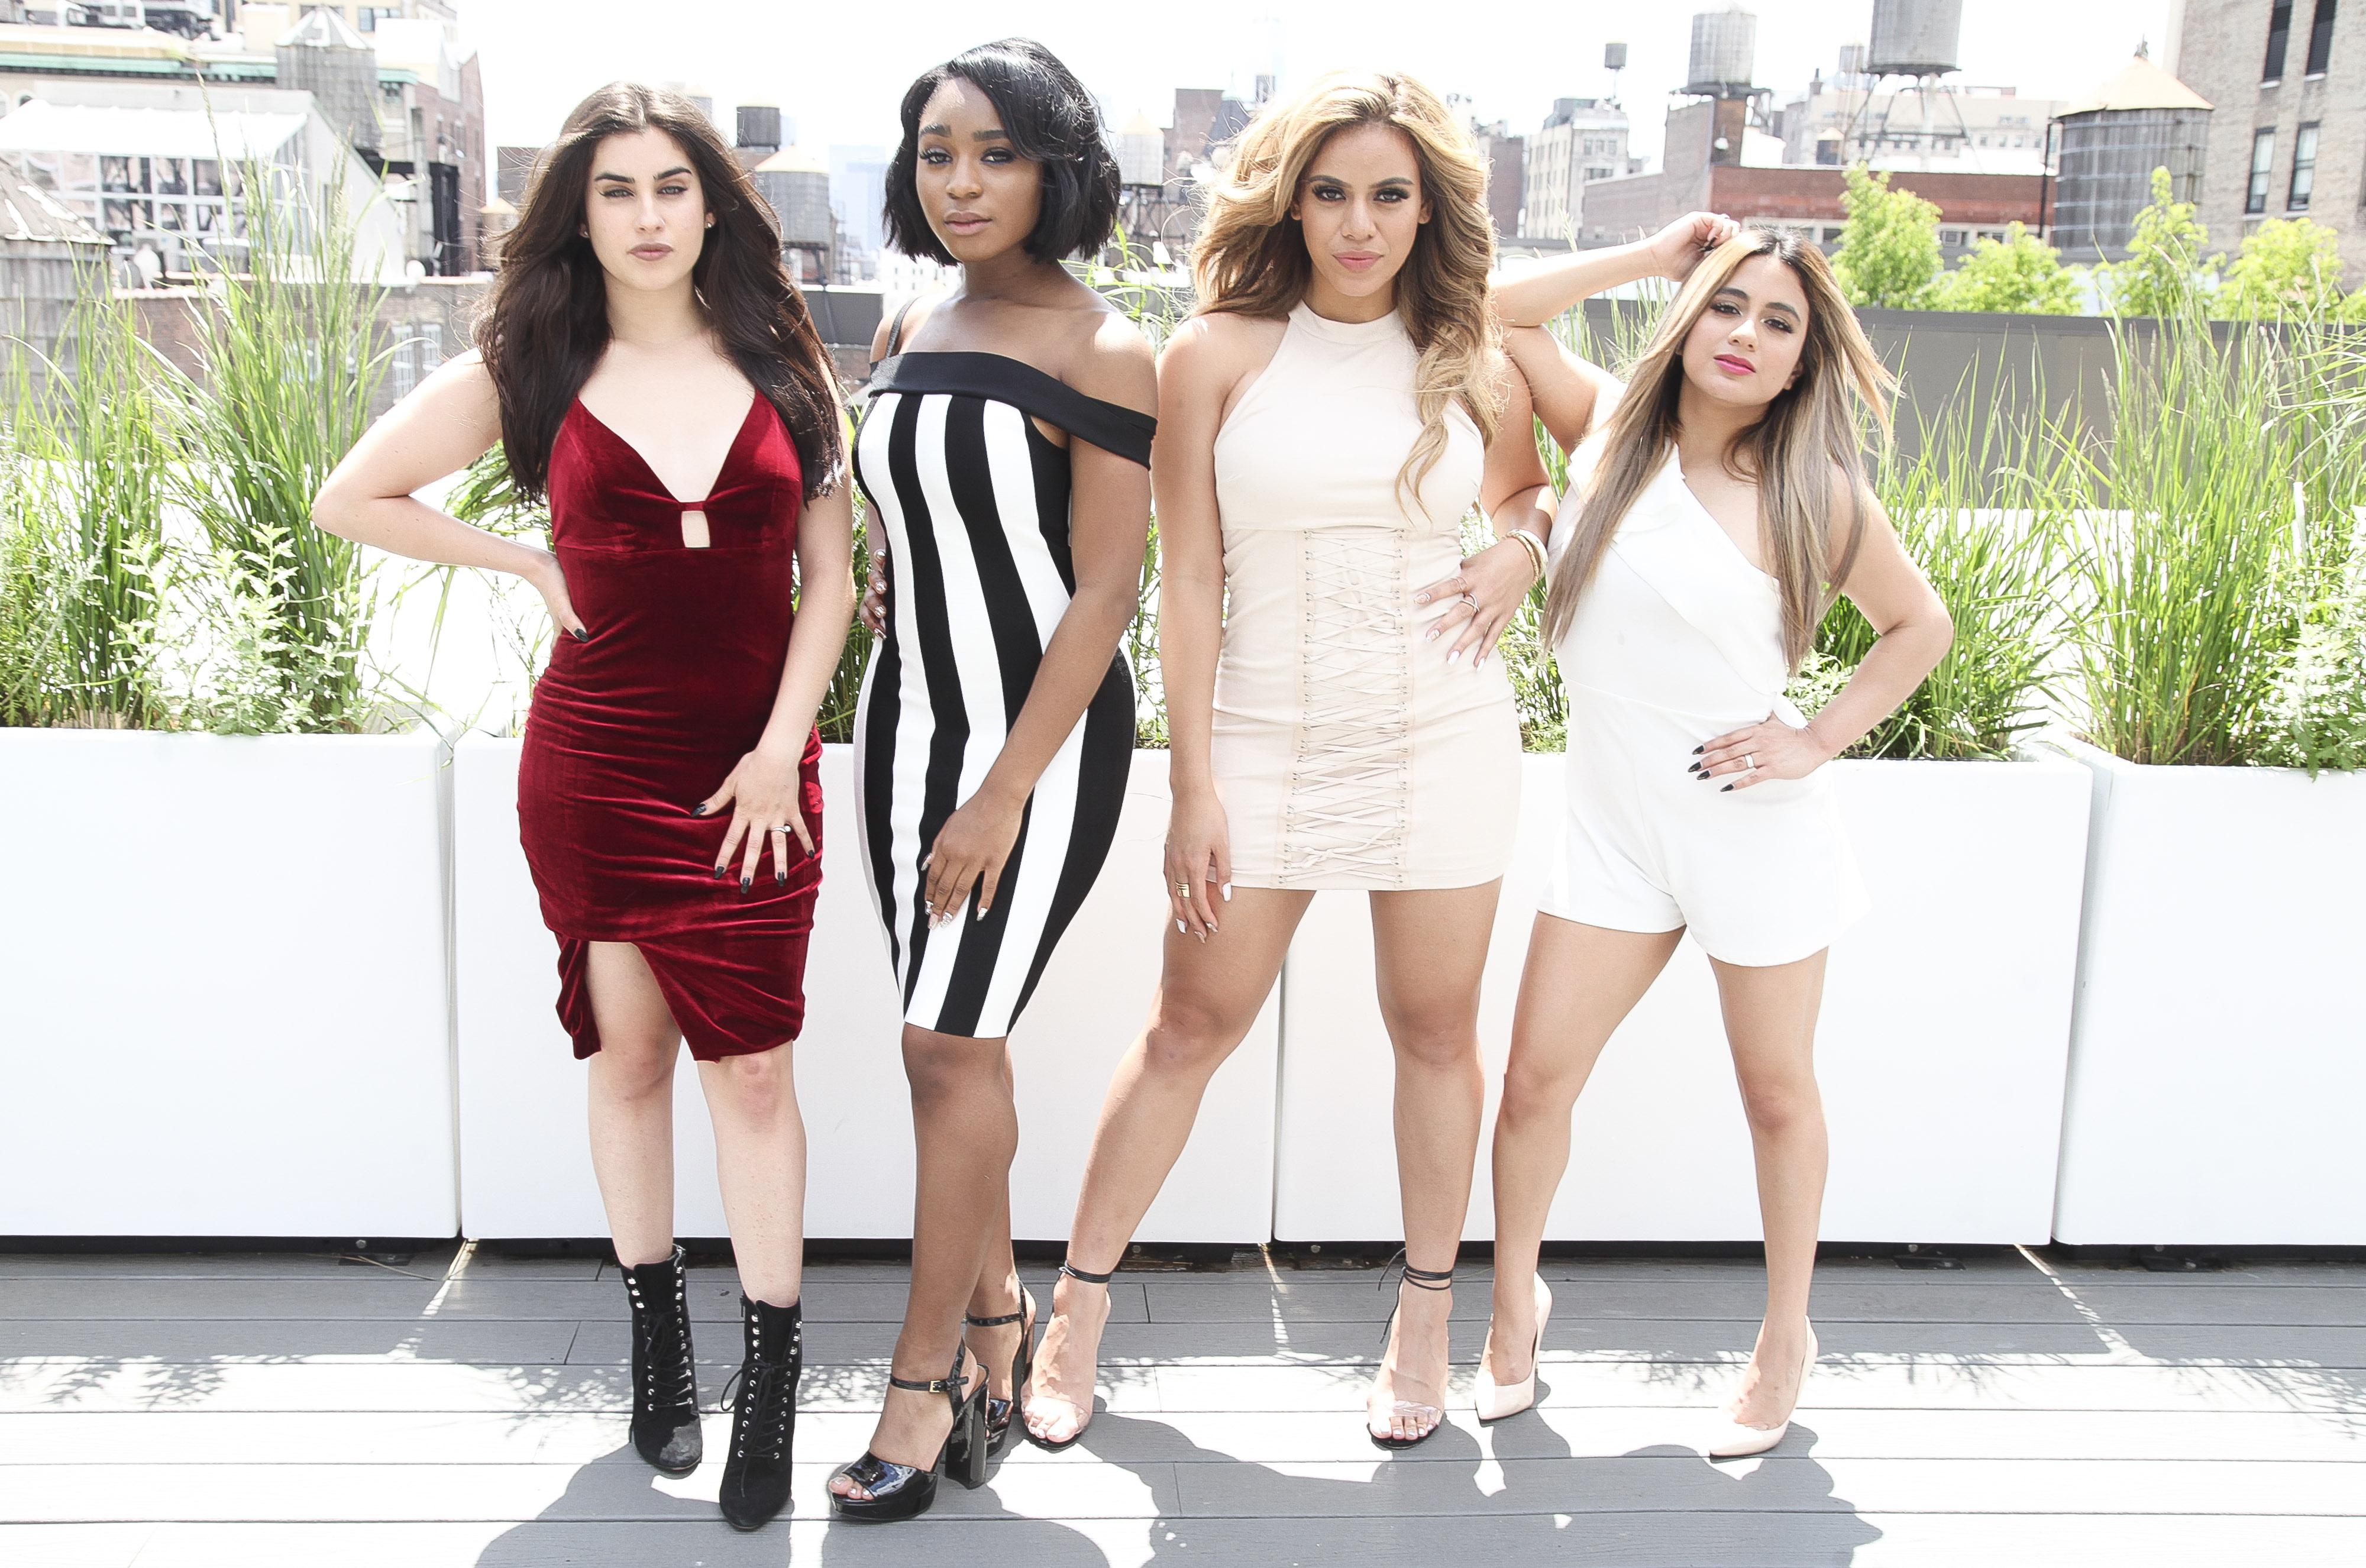 Lauren Jauregui, Normani Kordei, Dinah Jane, and Ally Brooke of Fifth Harmony